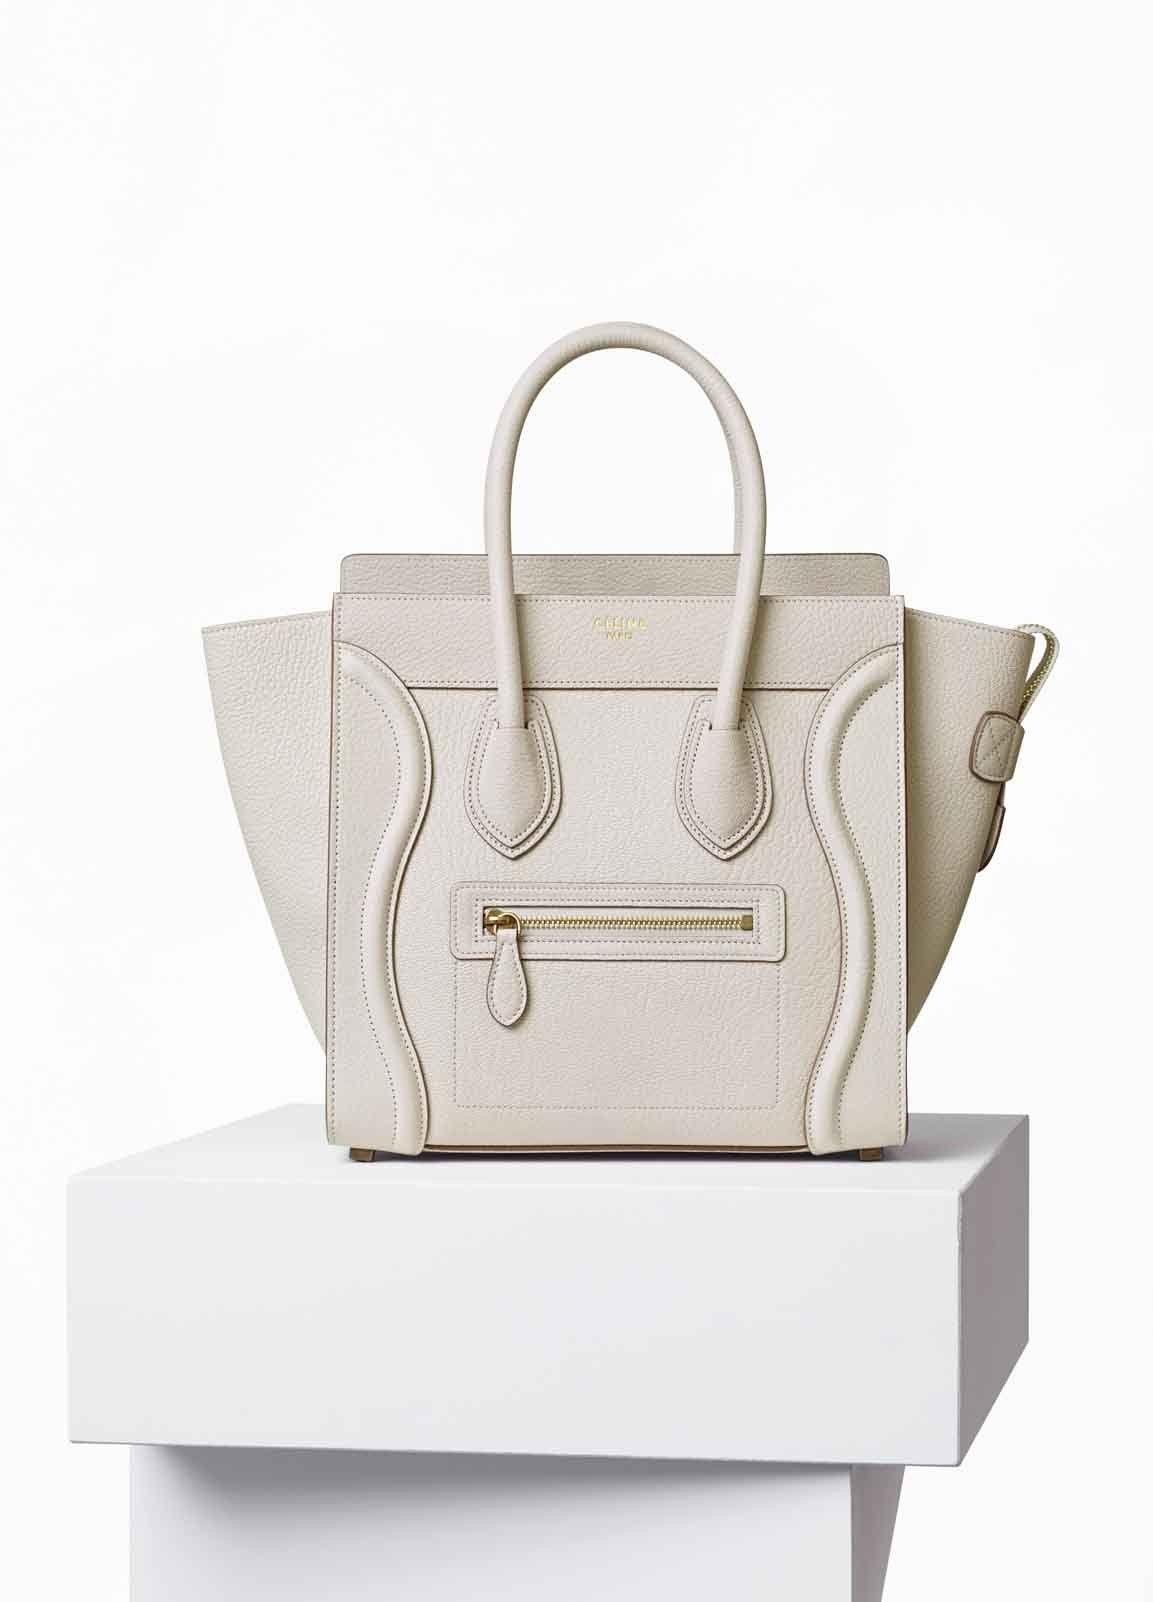 Blanc Céline Sacs Handbag À In Sac Main Mode Goatskin Luggage Micro wITqPWvAx